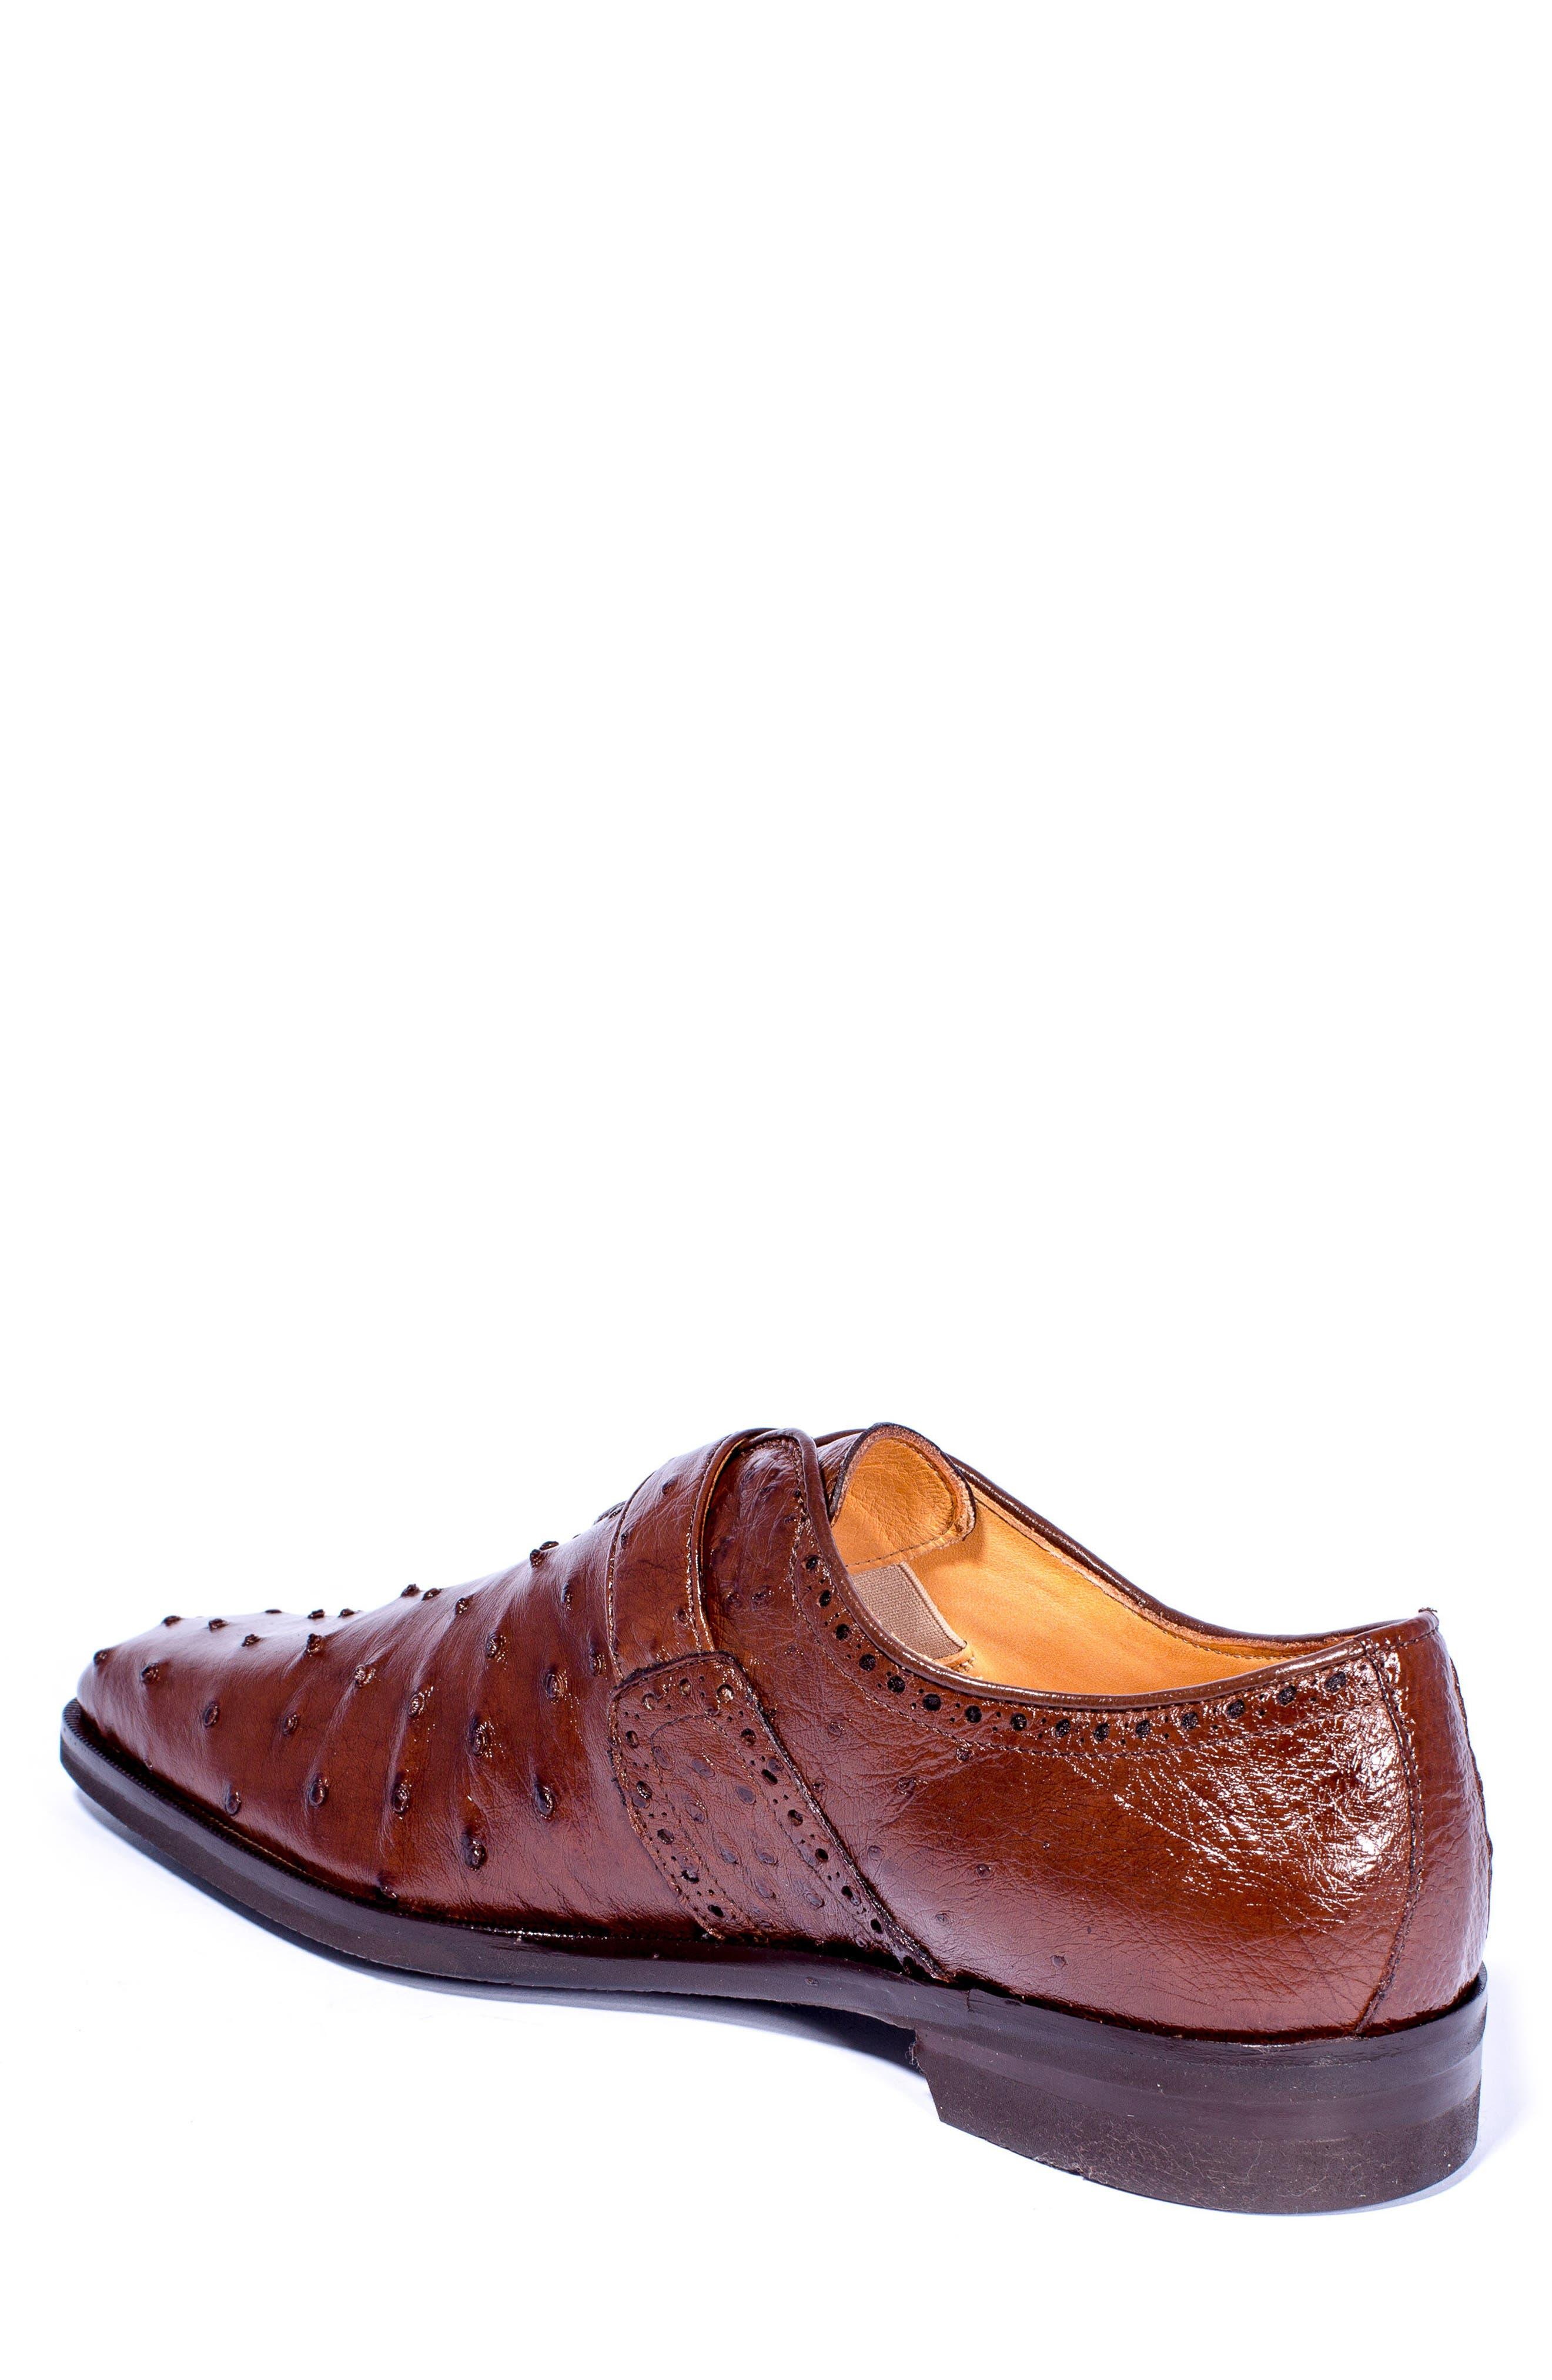 Alternate Image 2  - Zelli Antonio Monk Strap Ostrich Leather Shoe (Men)